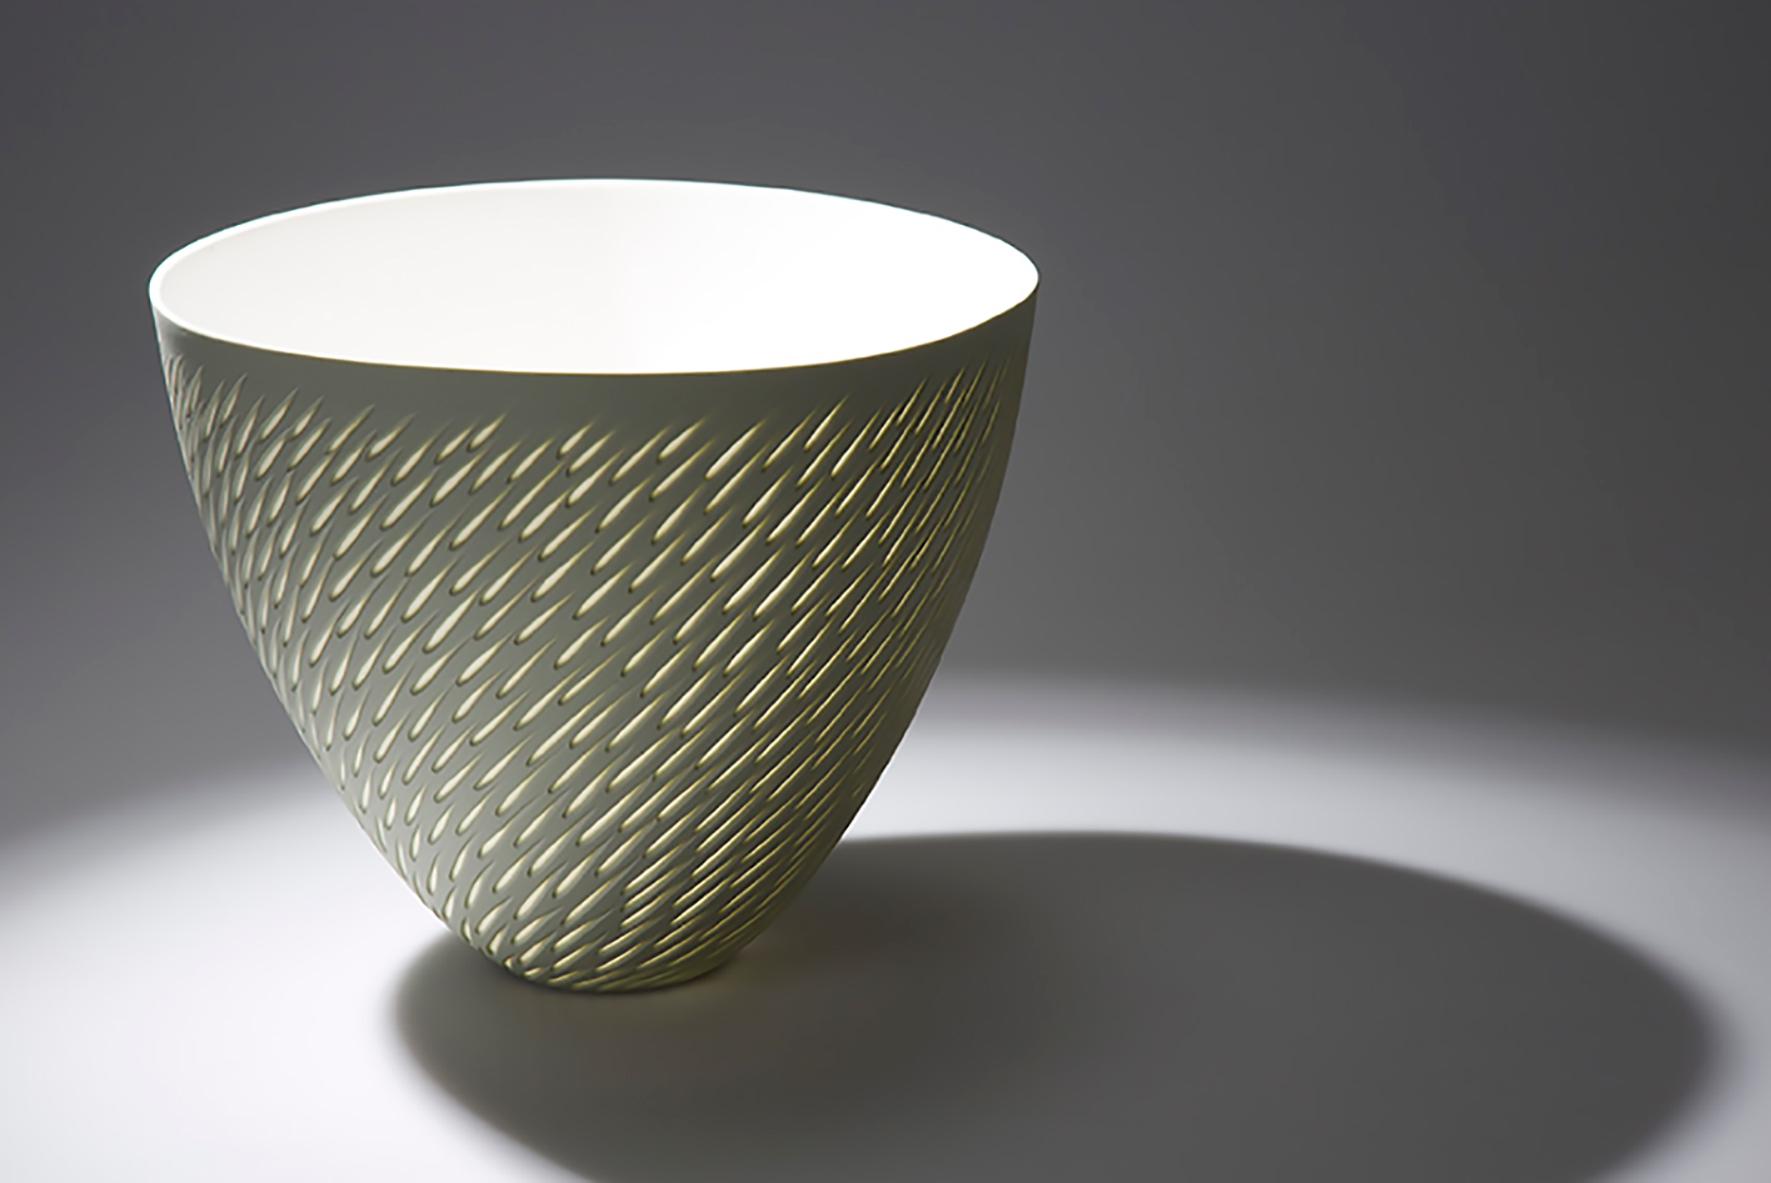 Olive Green, round rim - 28 cm h